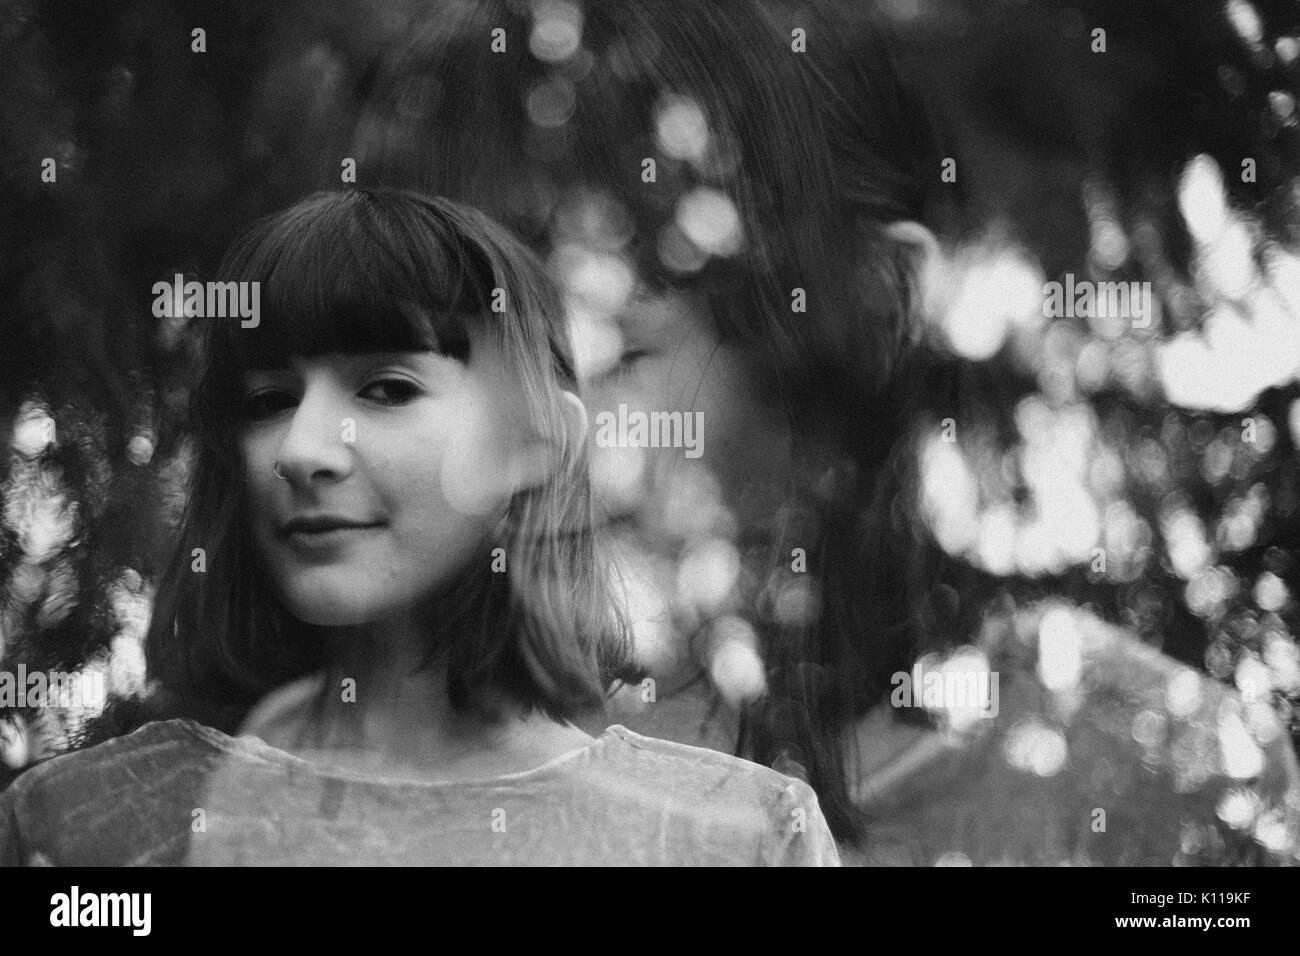 Woman in double exposure - Stock Image